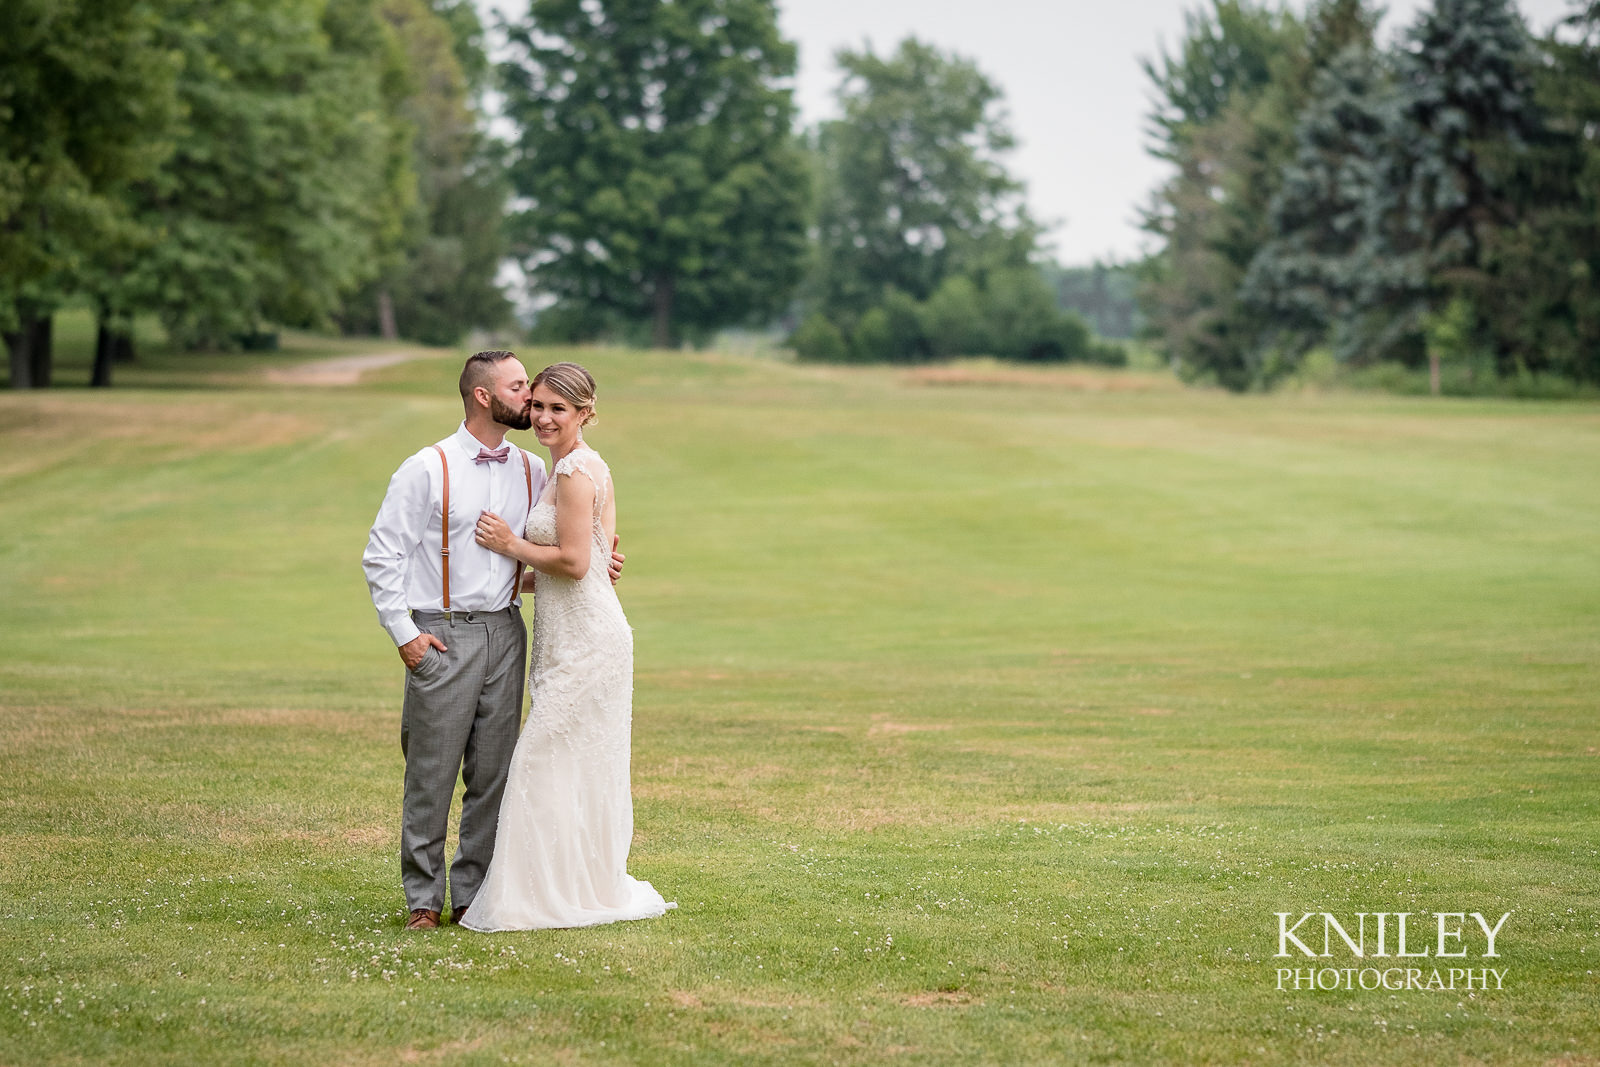 089 - Ontario Golf Club Wedding Pictures - XT2B9051.jpg